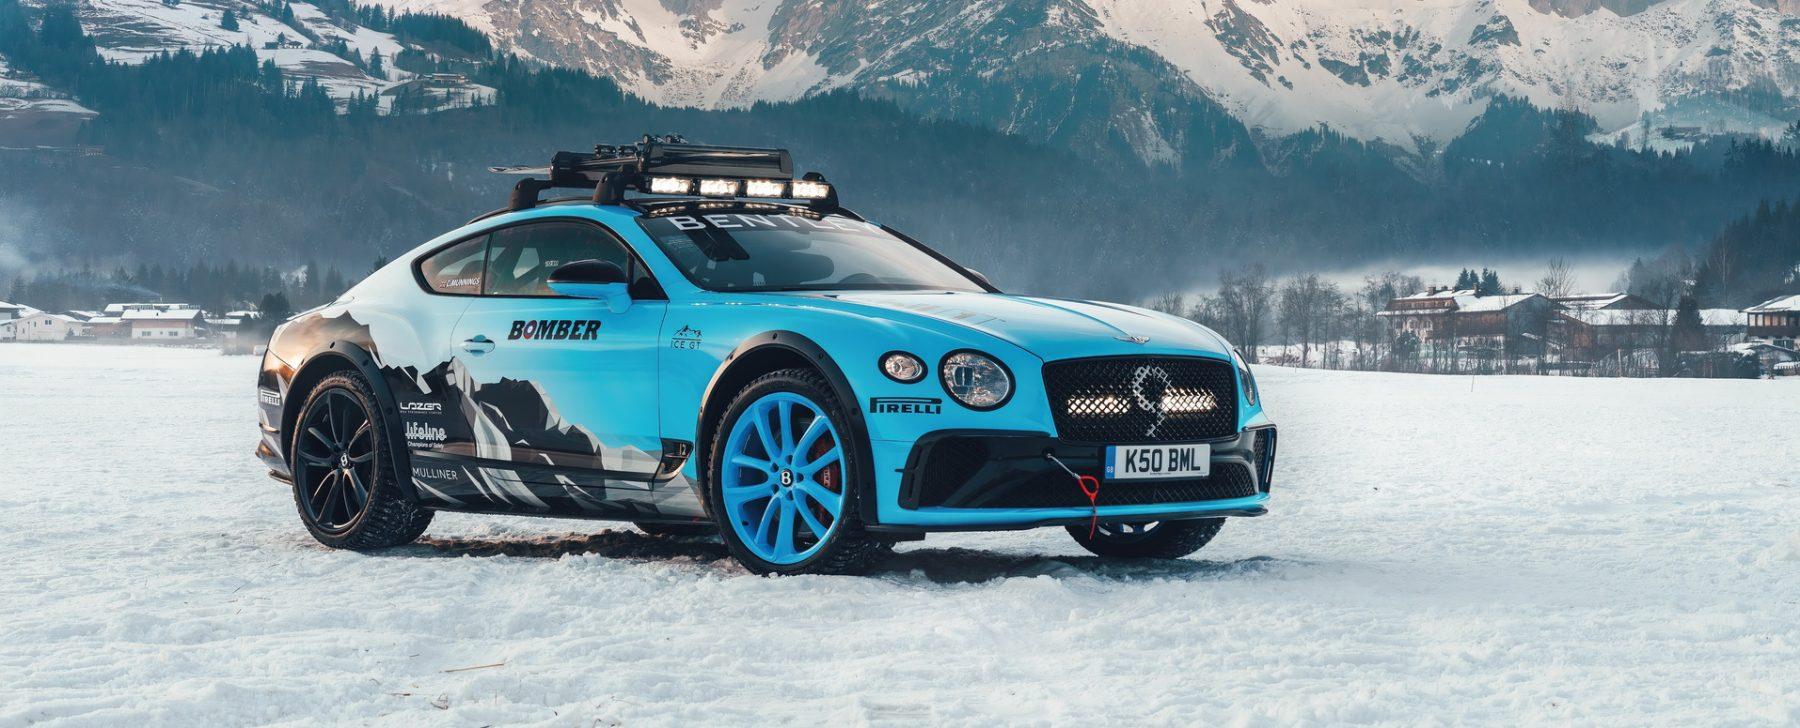 Bentley Ice Race Continental GT